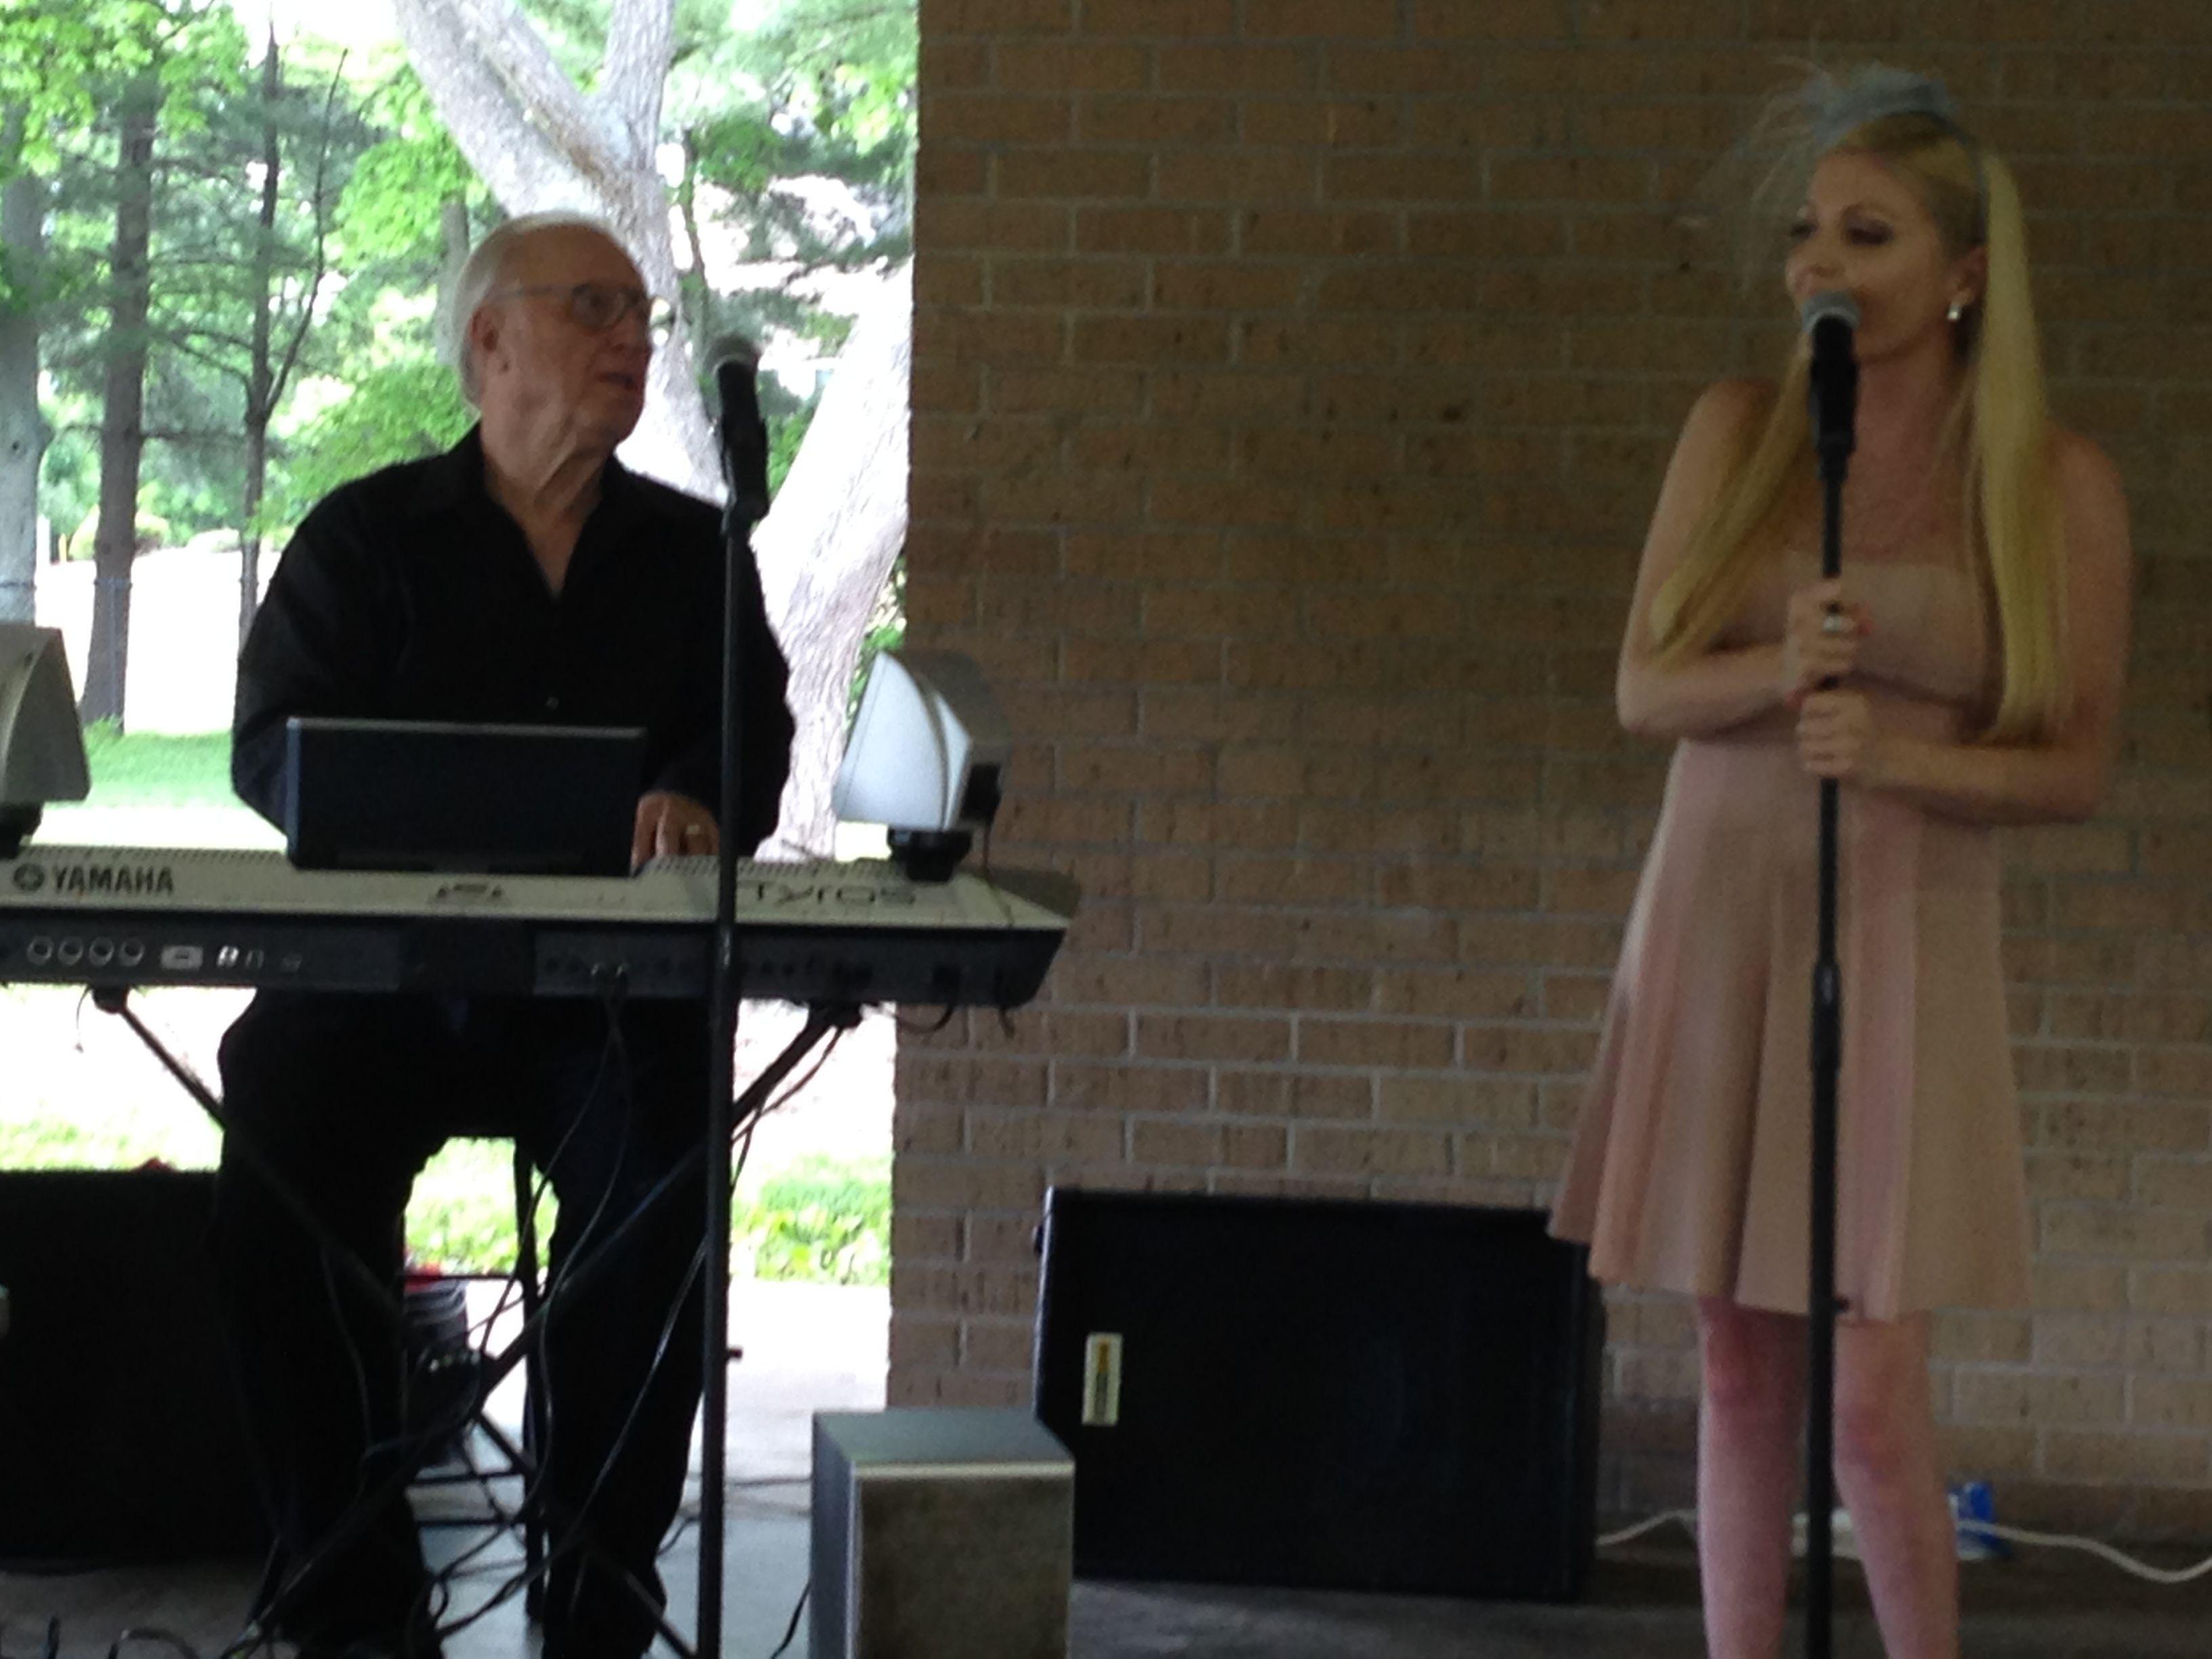 Nashville recording artist Laura Dodd accompanied by Grammy Award-winning songwriter Duane Hitchings. #konadubodycarelaunch